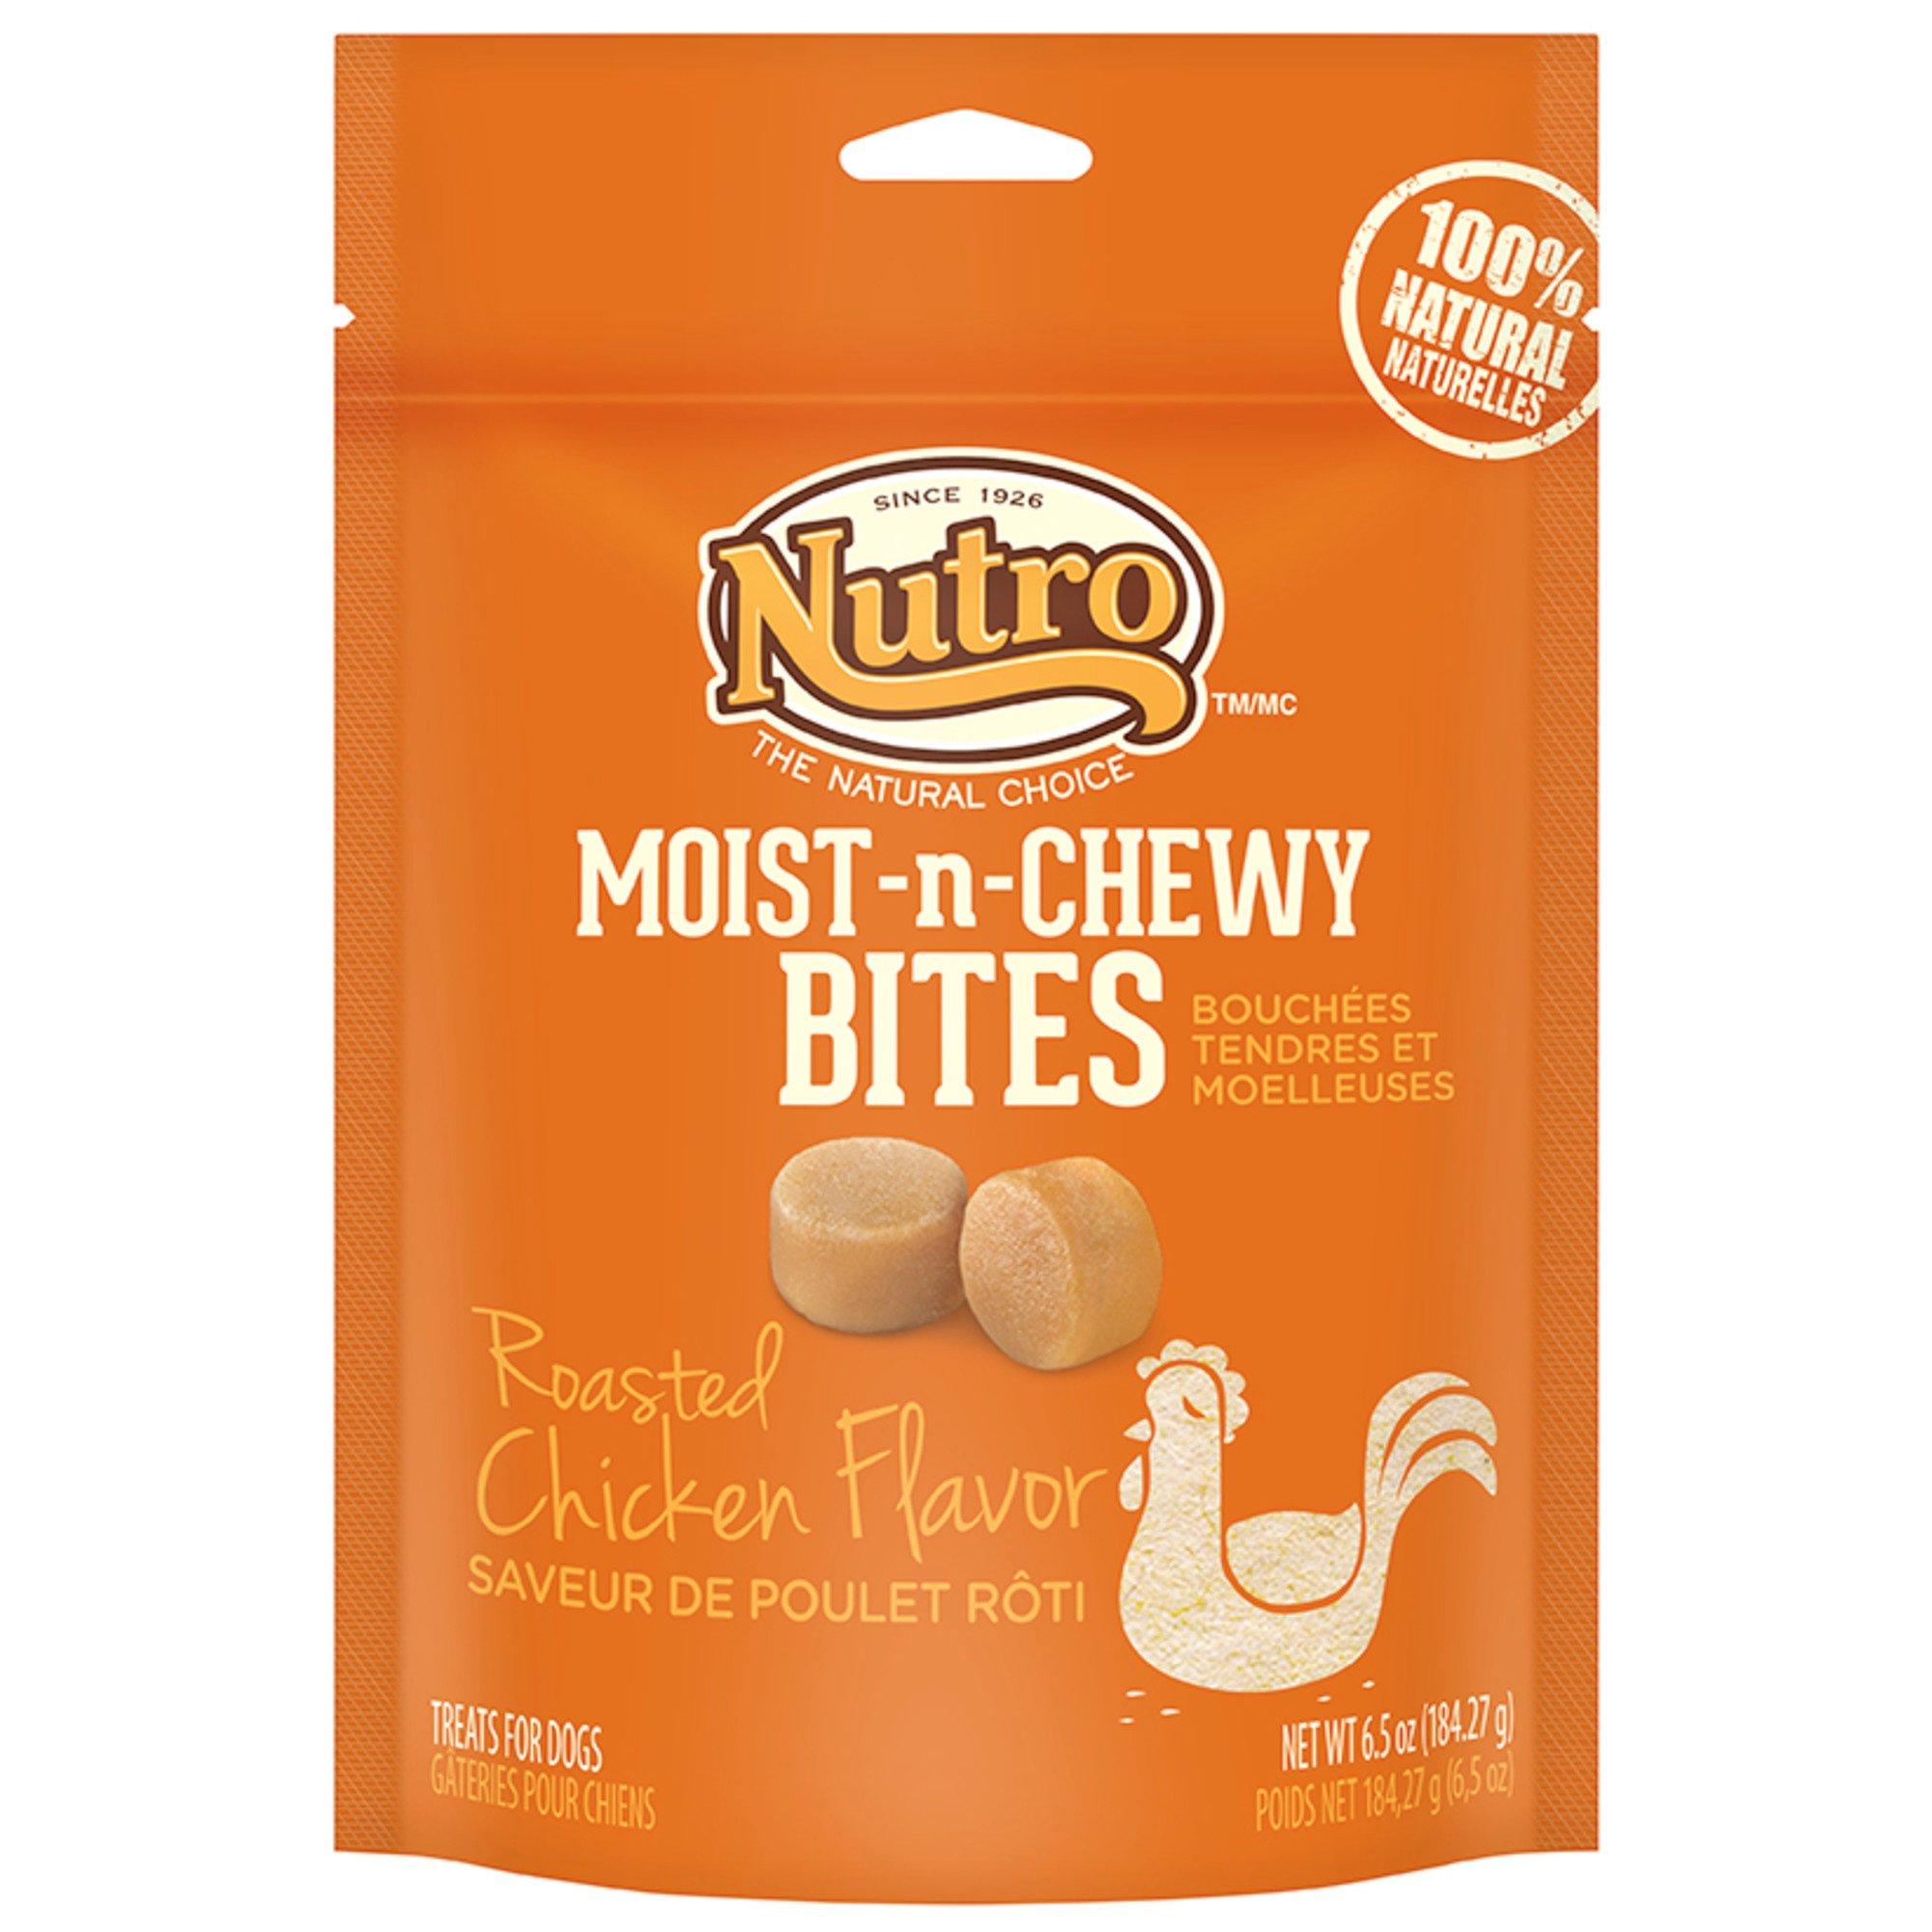 Nutro Moist-n-Chewy Bites Chicken Dog Treats